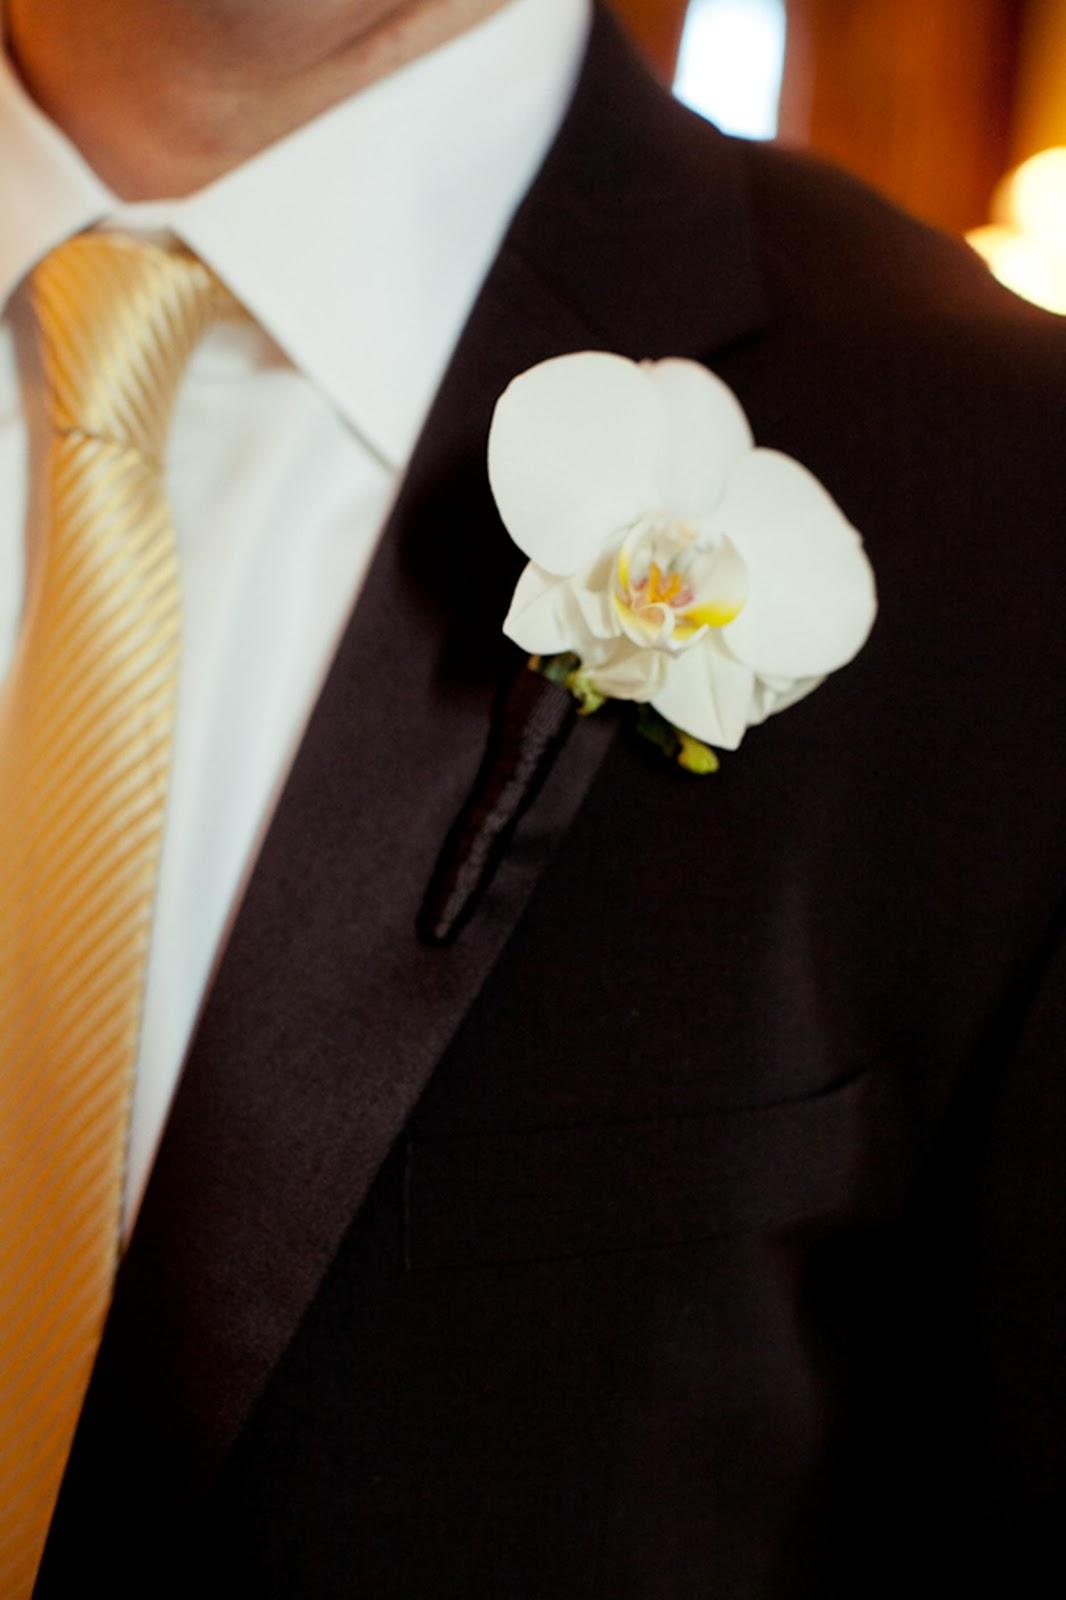 Orchid Boutonniere - Boutonnieres - Wedding Flowers - Groom - Usher - Best Man - Groomsmen - Ushers - Groom's Boutonniere